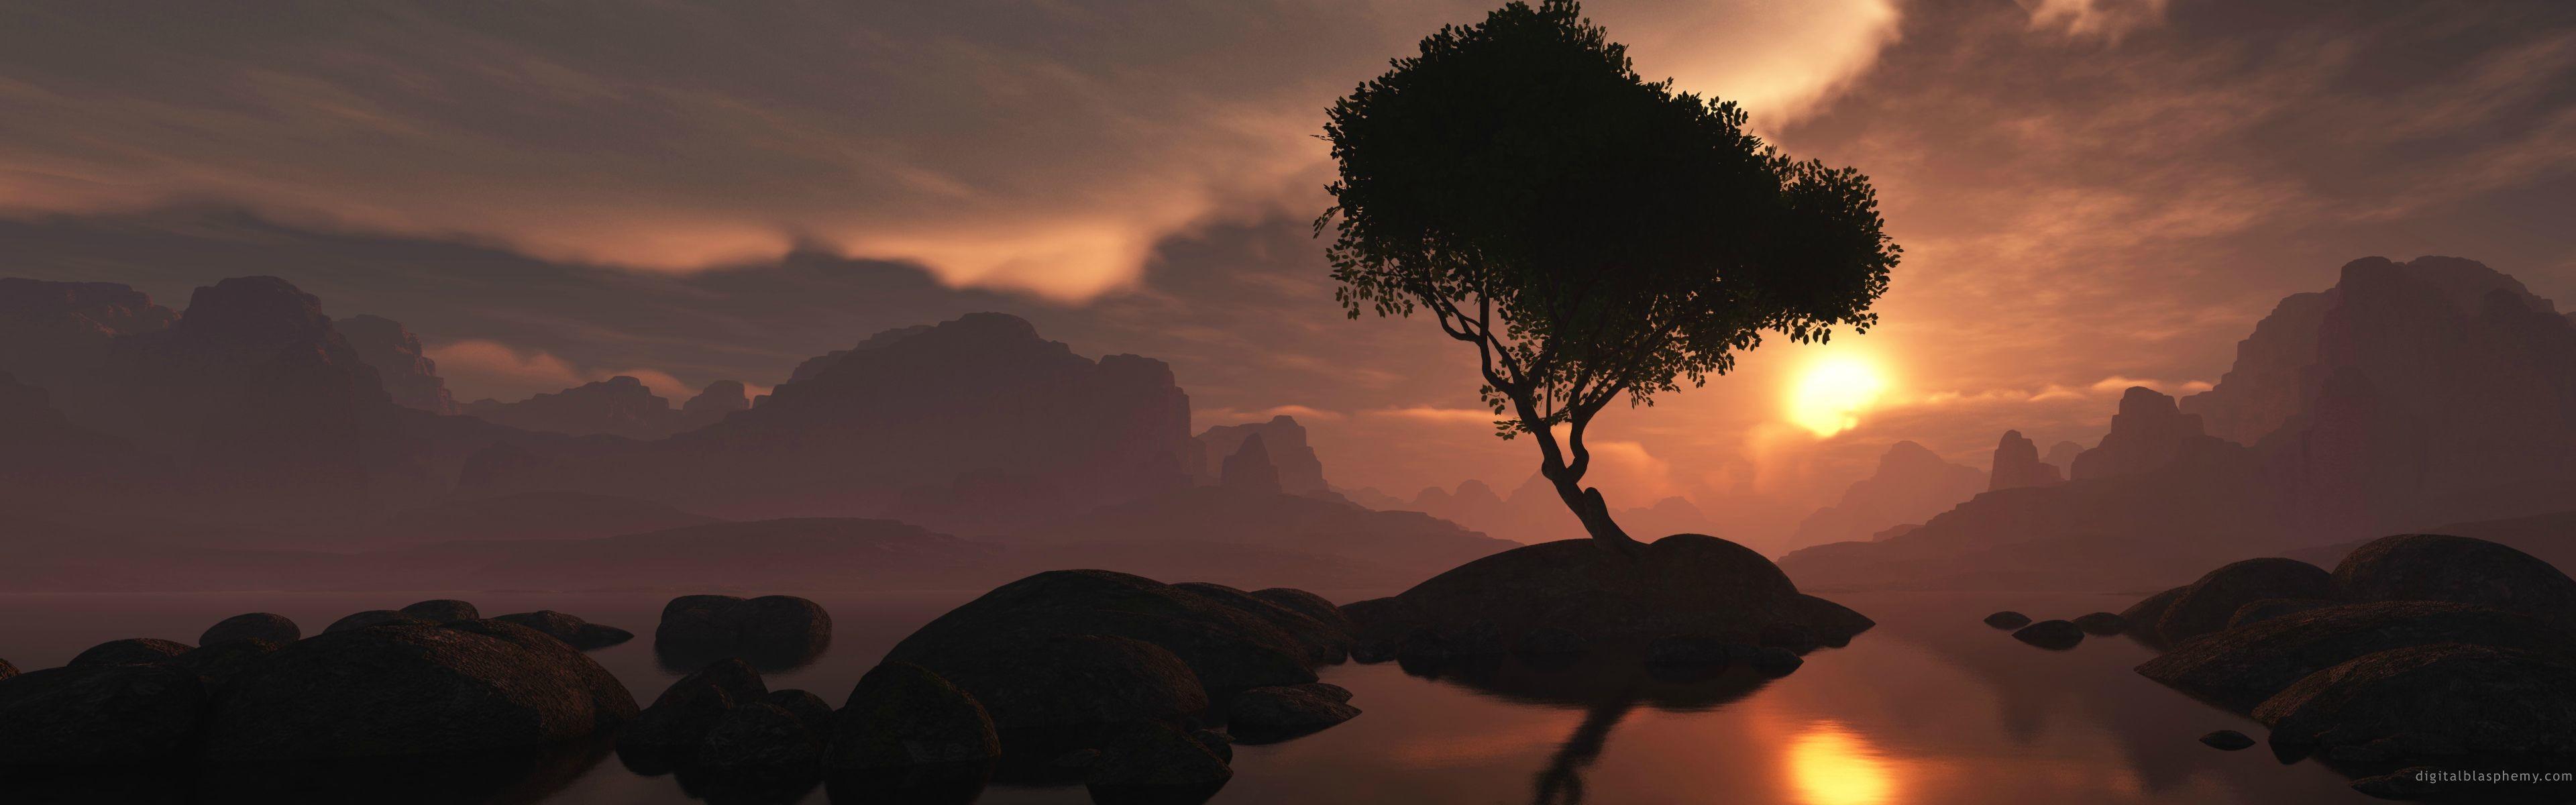 Digital Blasphemy Wallpaper: Lone Tree by Ryan Bliss